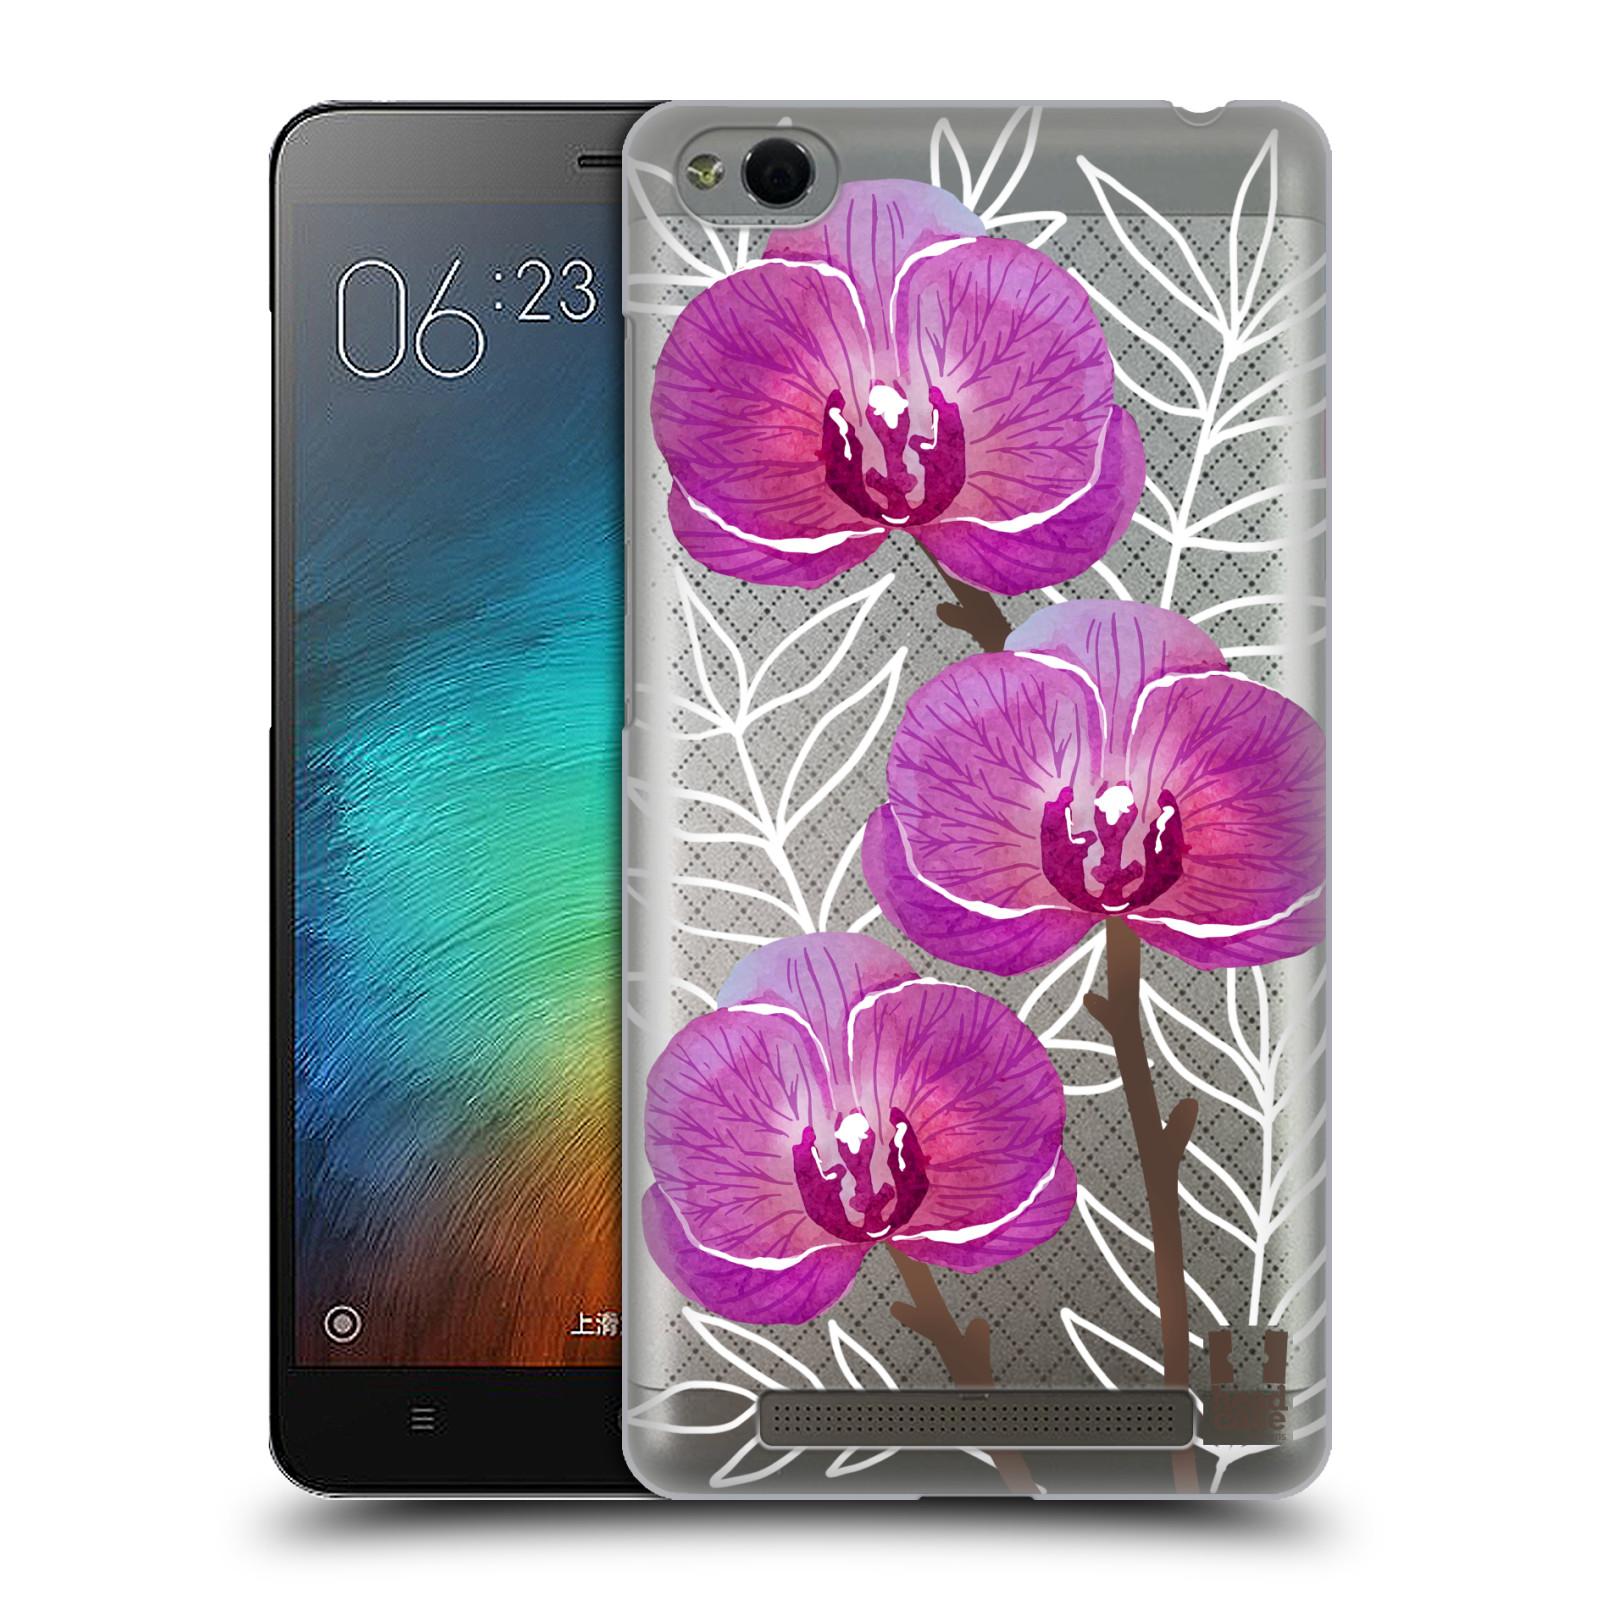 Plastové pouzdro na mobil Xiaomi Redmi 3 - Head Case - Hezoučké kvítky - průhledné